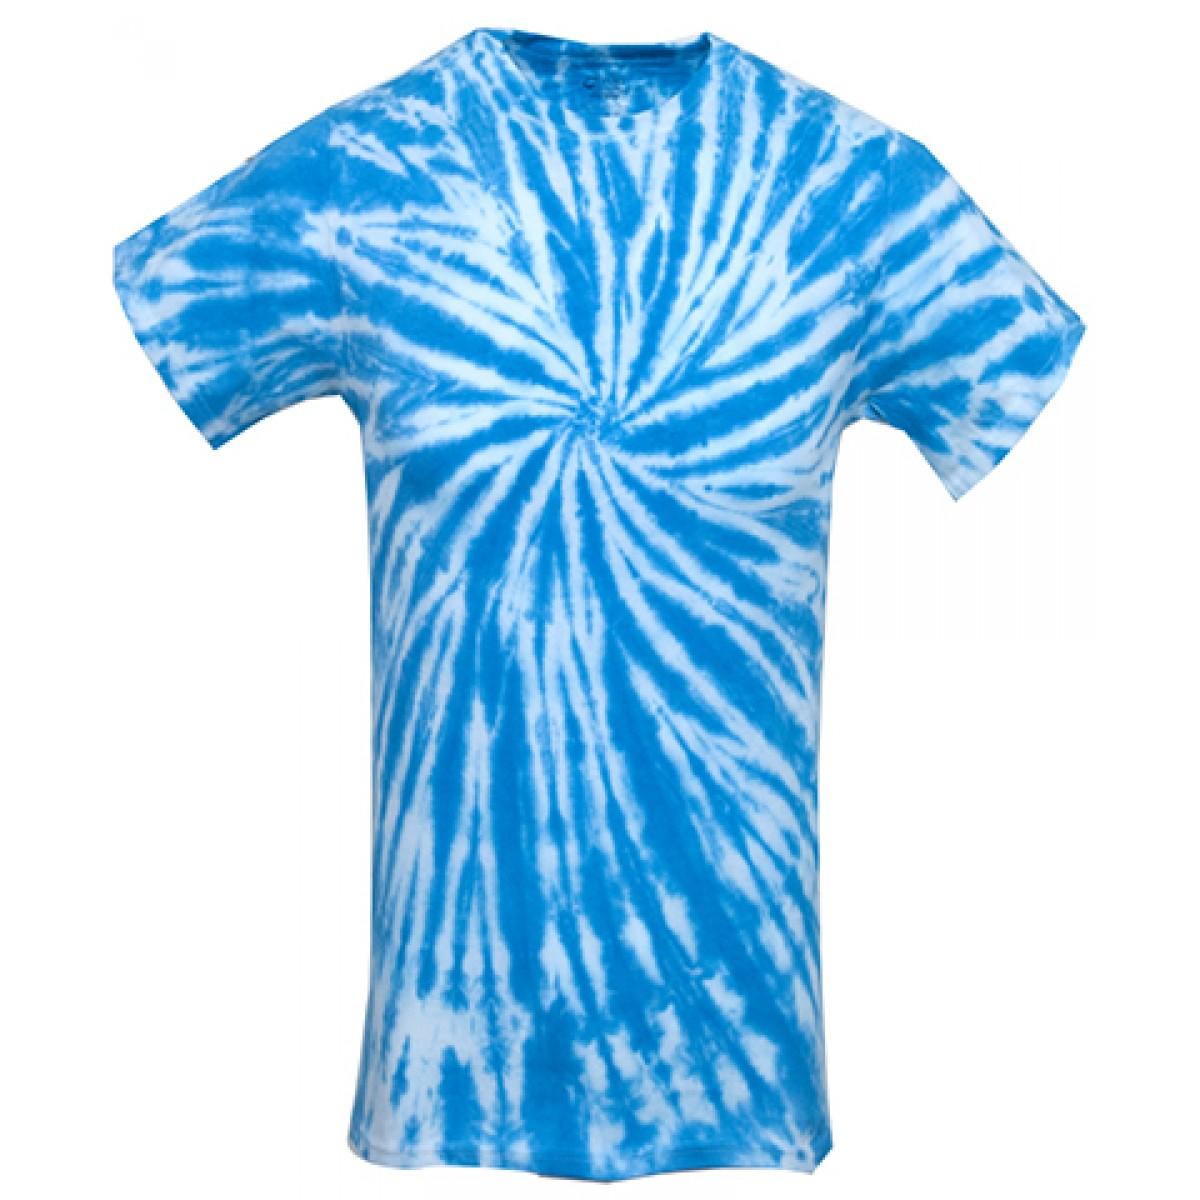 Tie-Dye Short Sleeve Shirts-White/Blue-YM